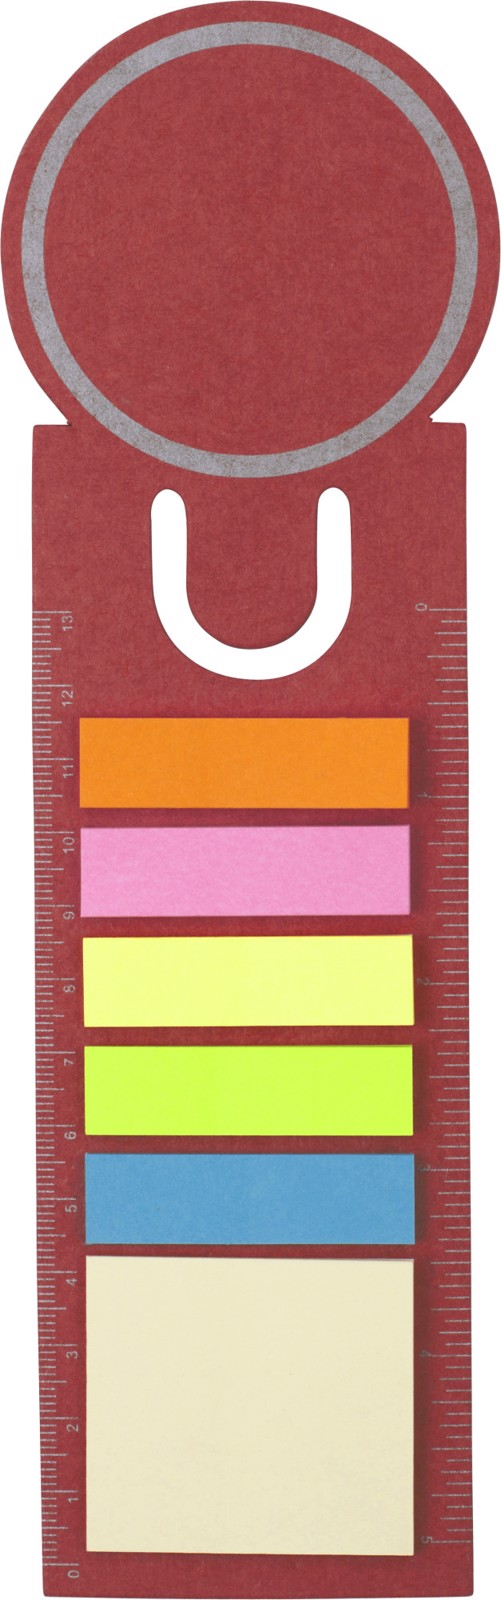 Cardboard bookmark - Red